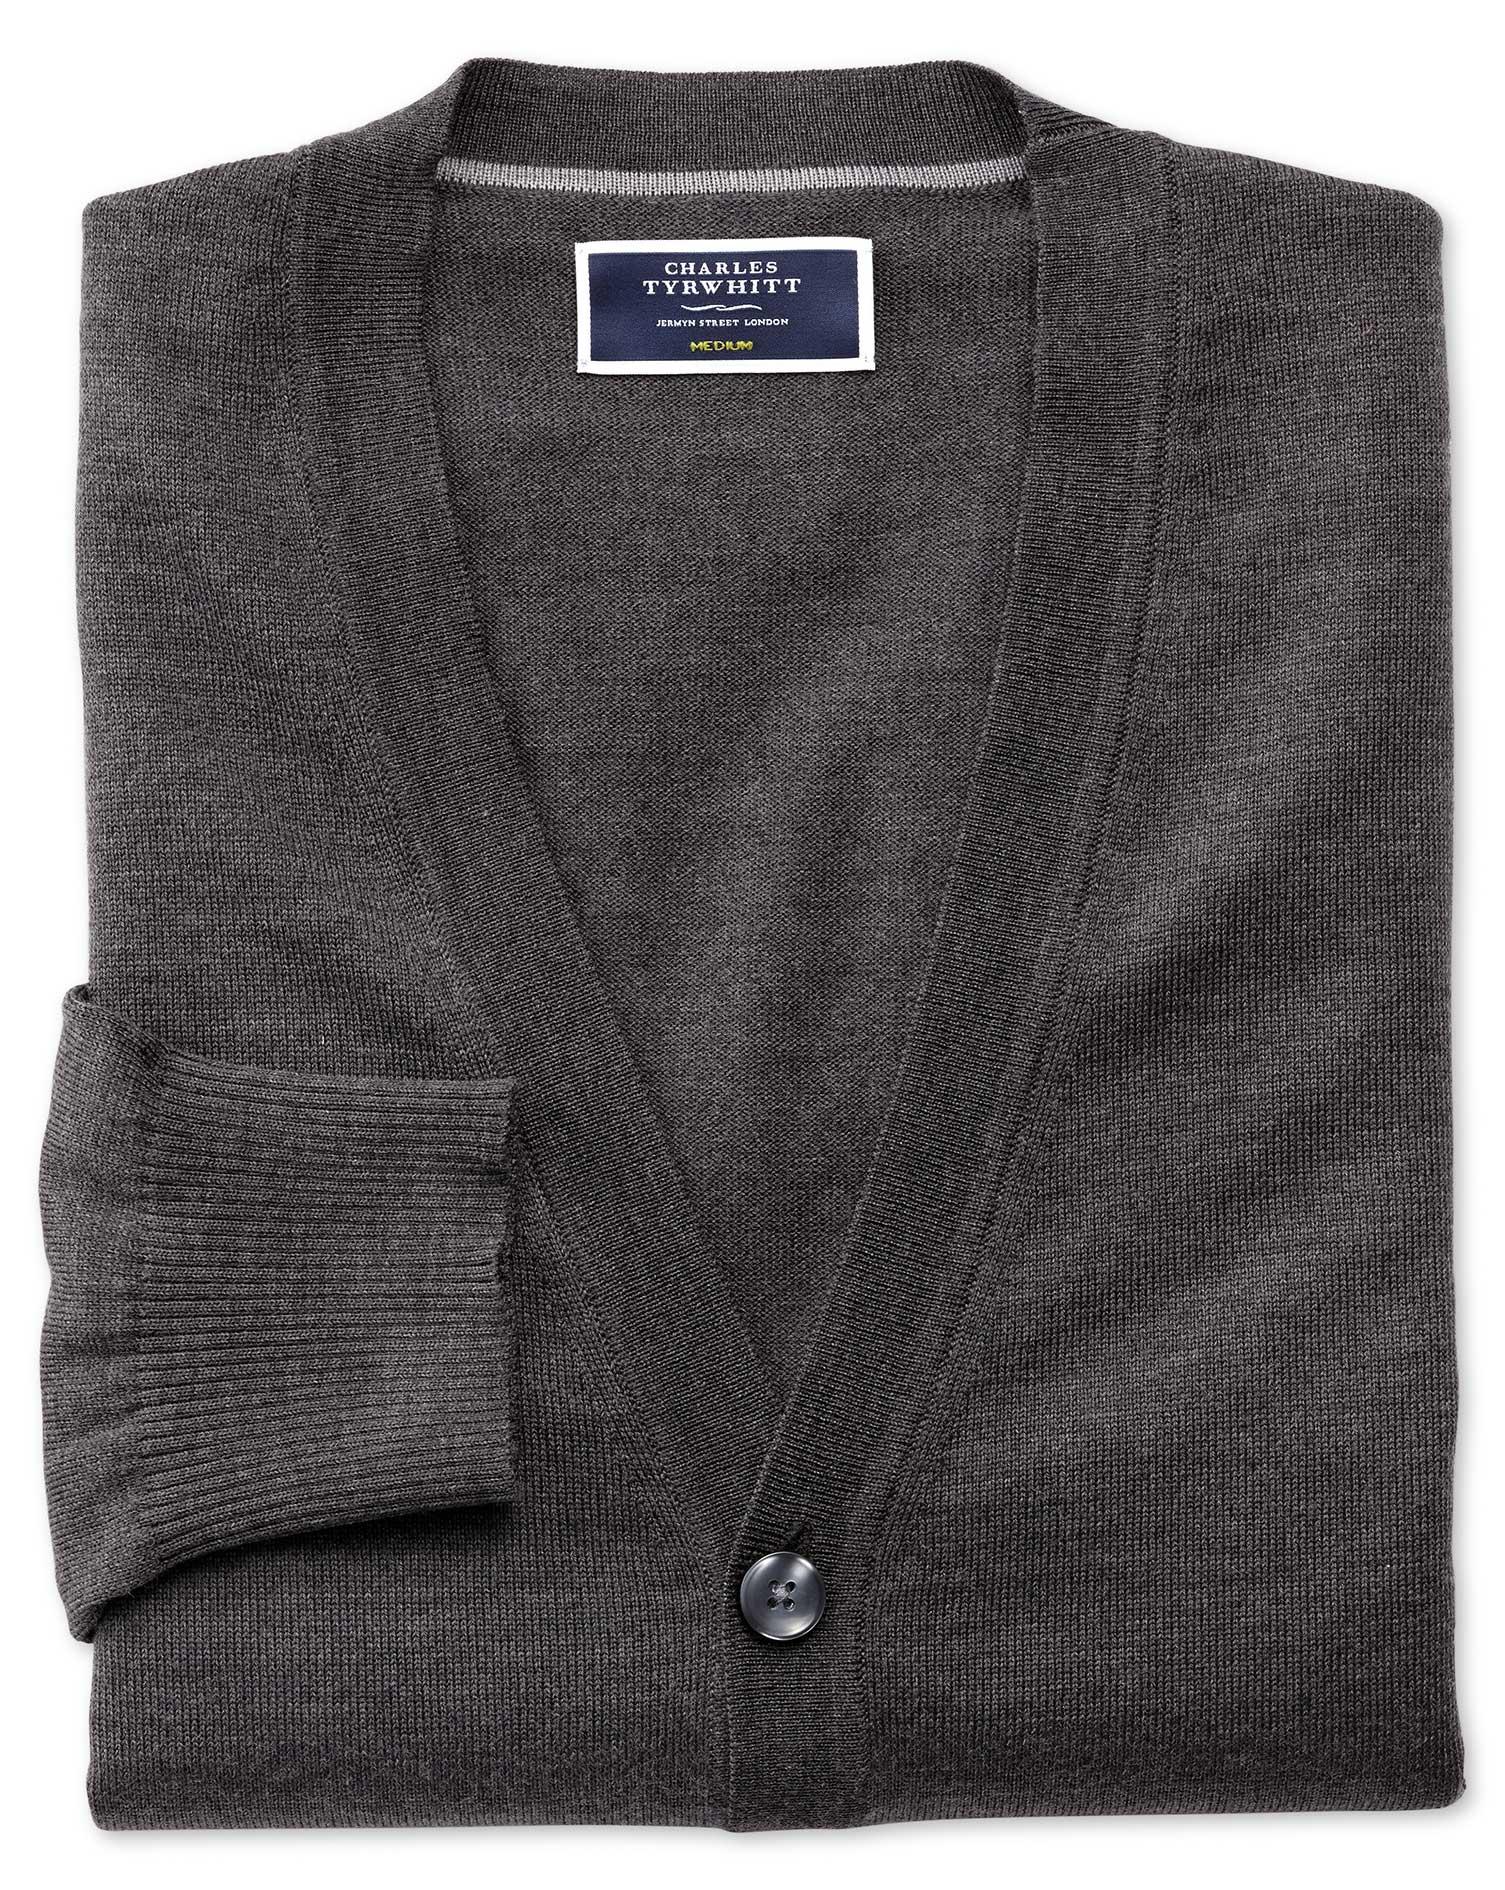 Charcoal Merino Wool Cardigan Size Medium by Charles Tyrwhitt